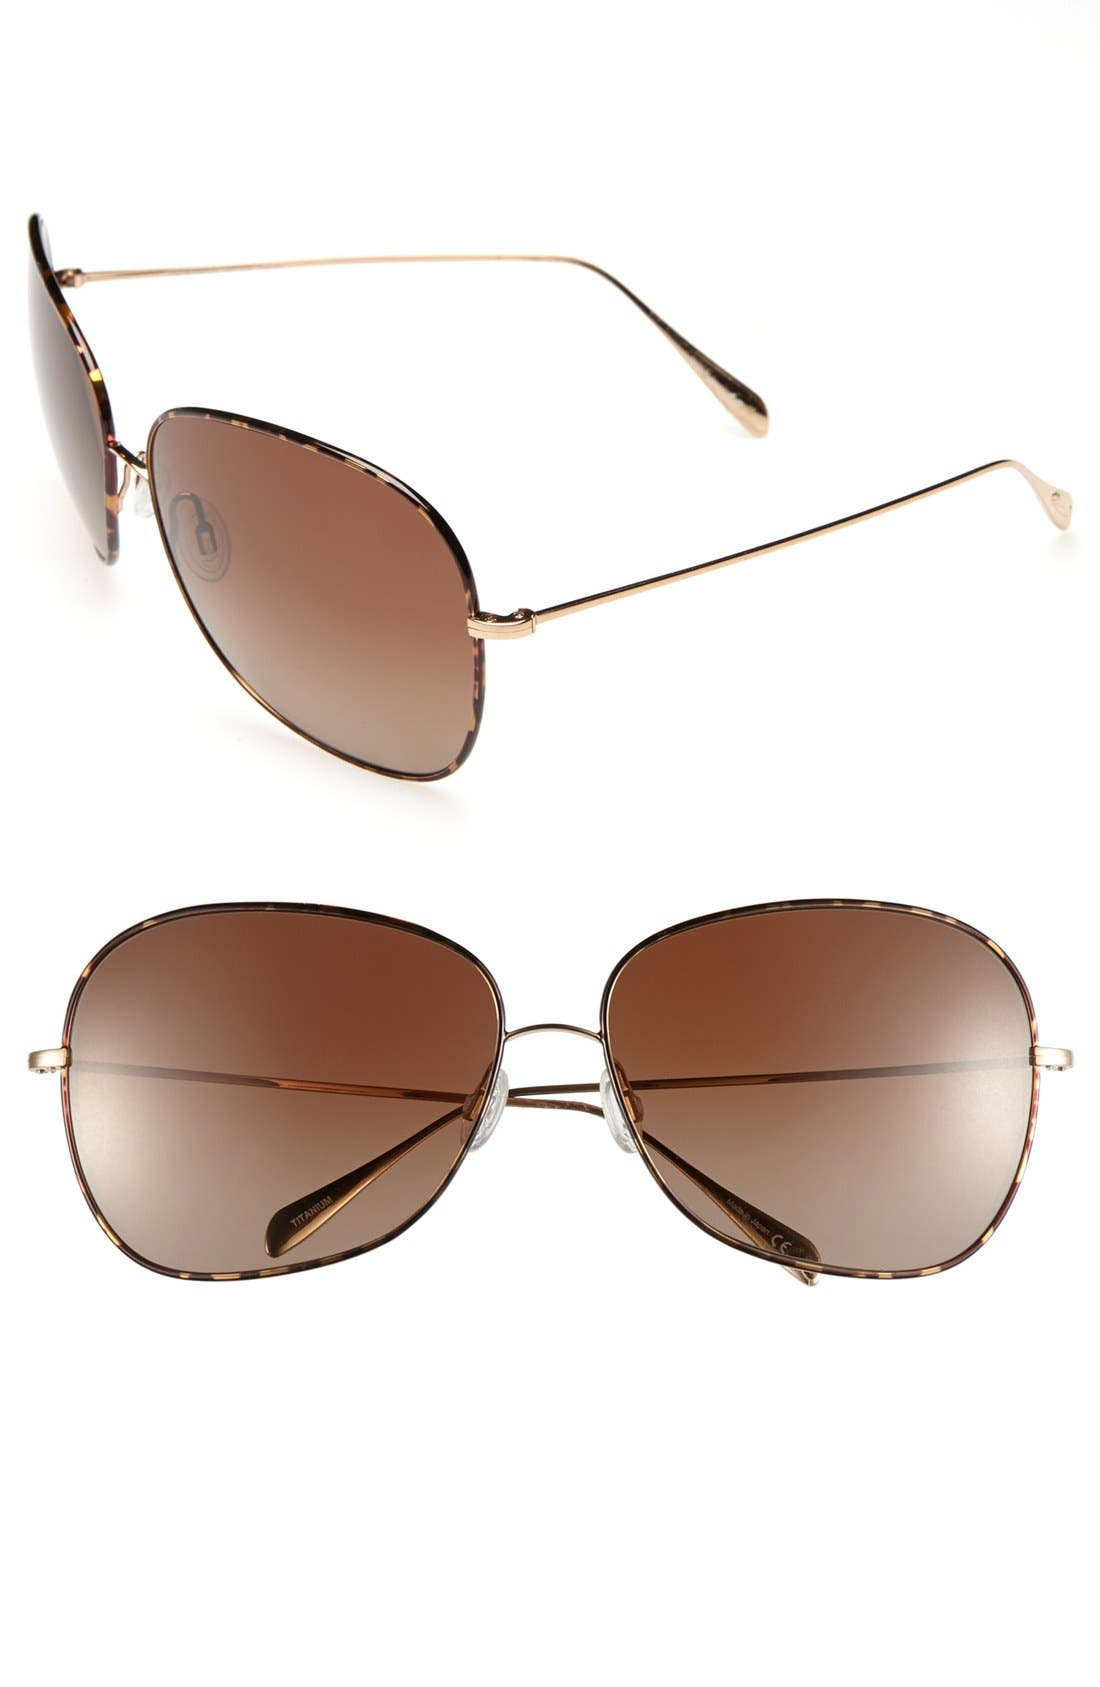 Alternate Image 1 Selected - Oliver Peoples 'Elsie' 64mm Polarized Sunglasses